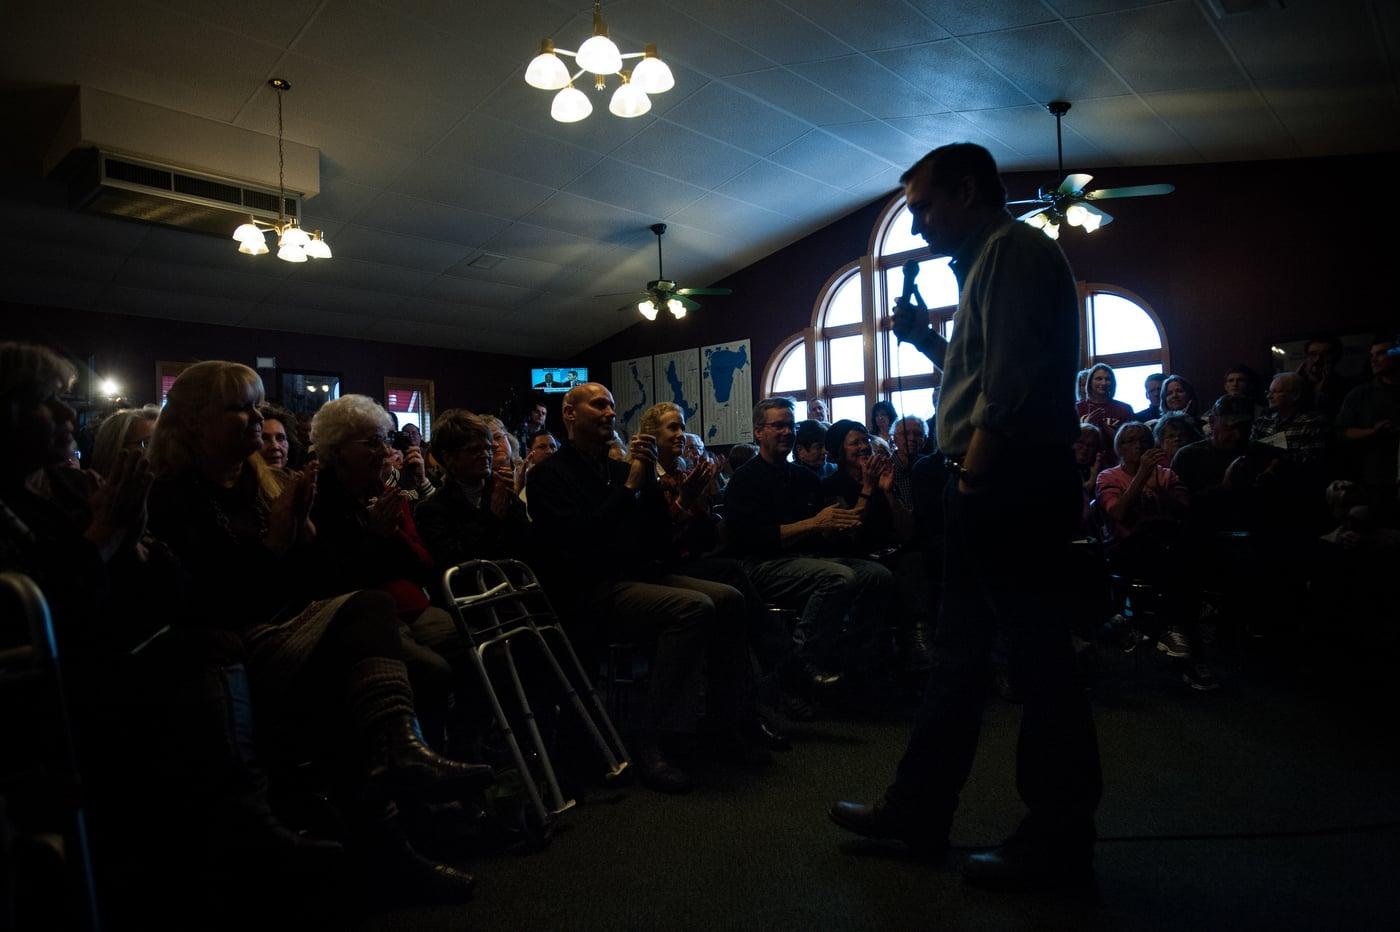 U.S. Republican presidential candidate Ted Cruz speaks at Godfather's Pizza in Spirit Lake, Iowa January 6, 2016. REUTERS/Mark Kauzlarich